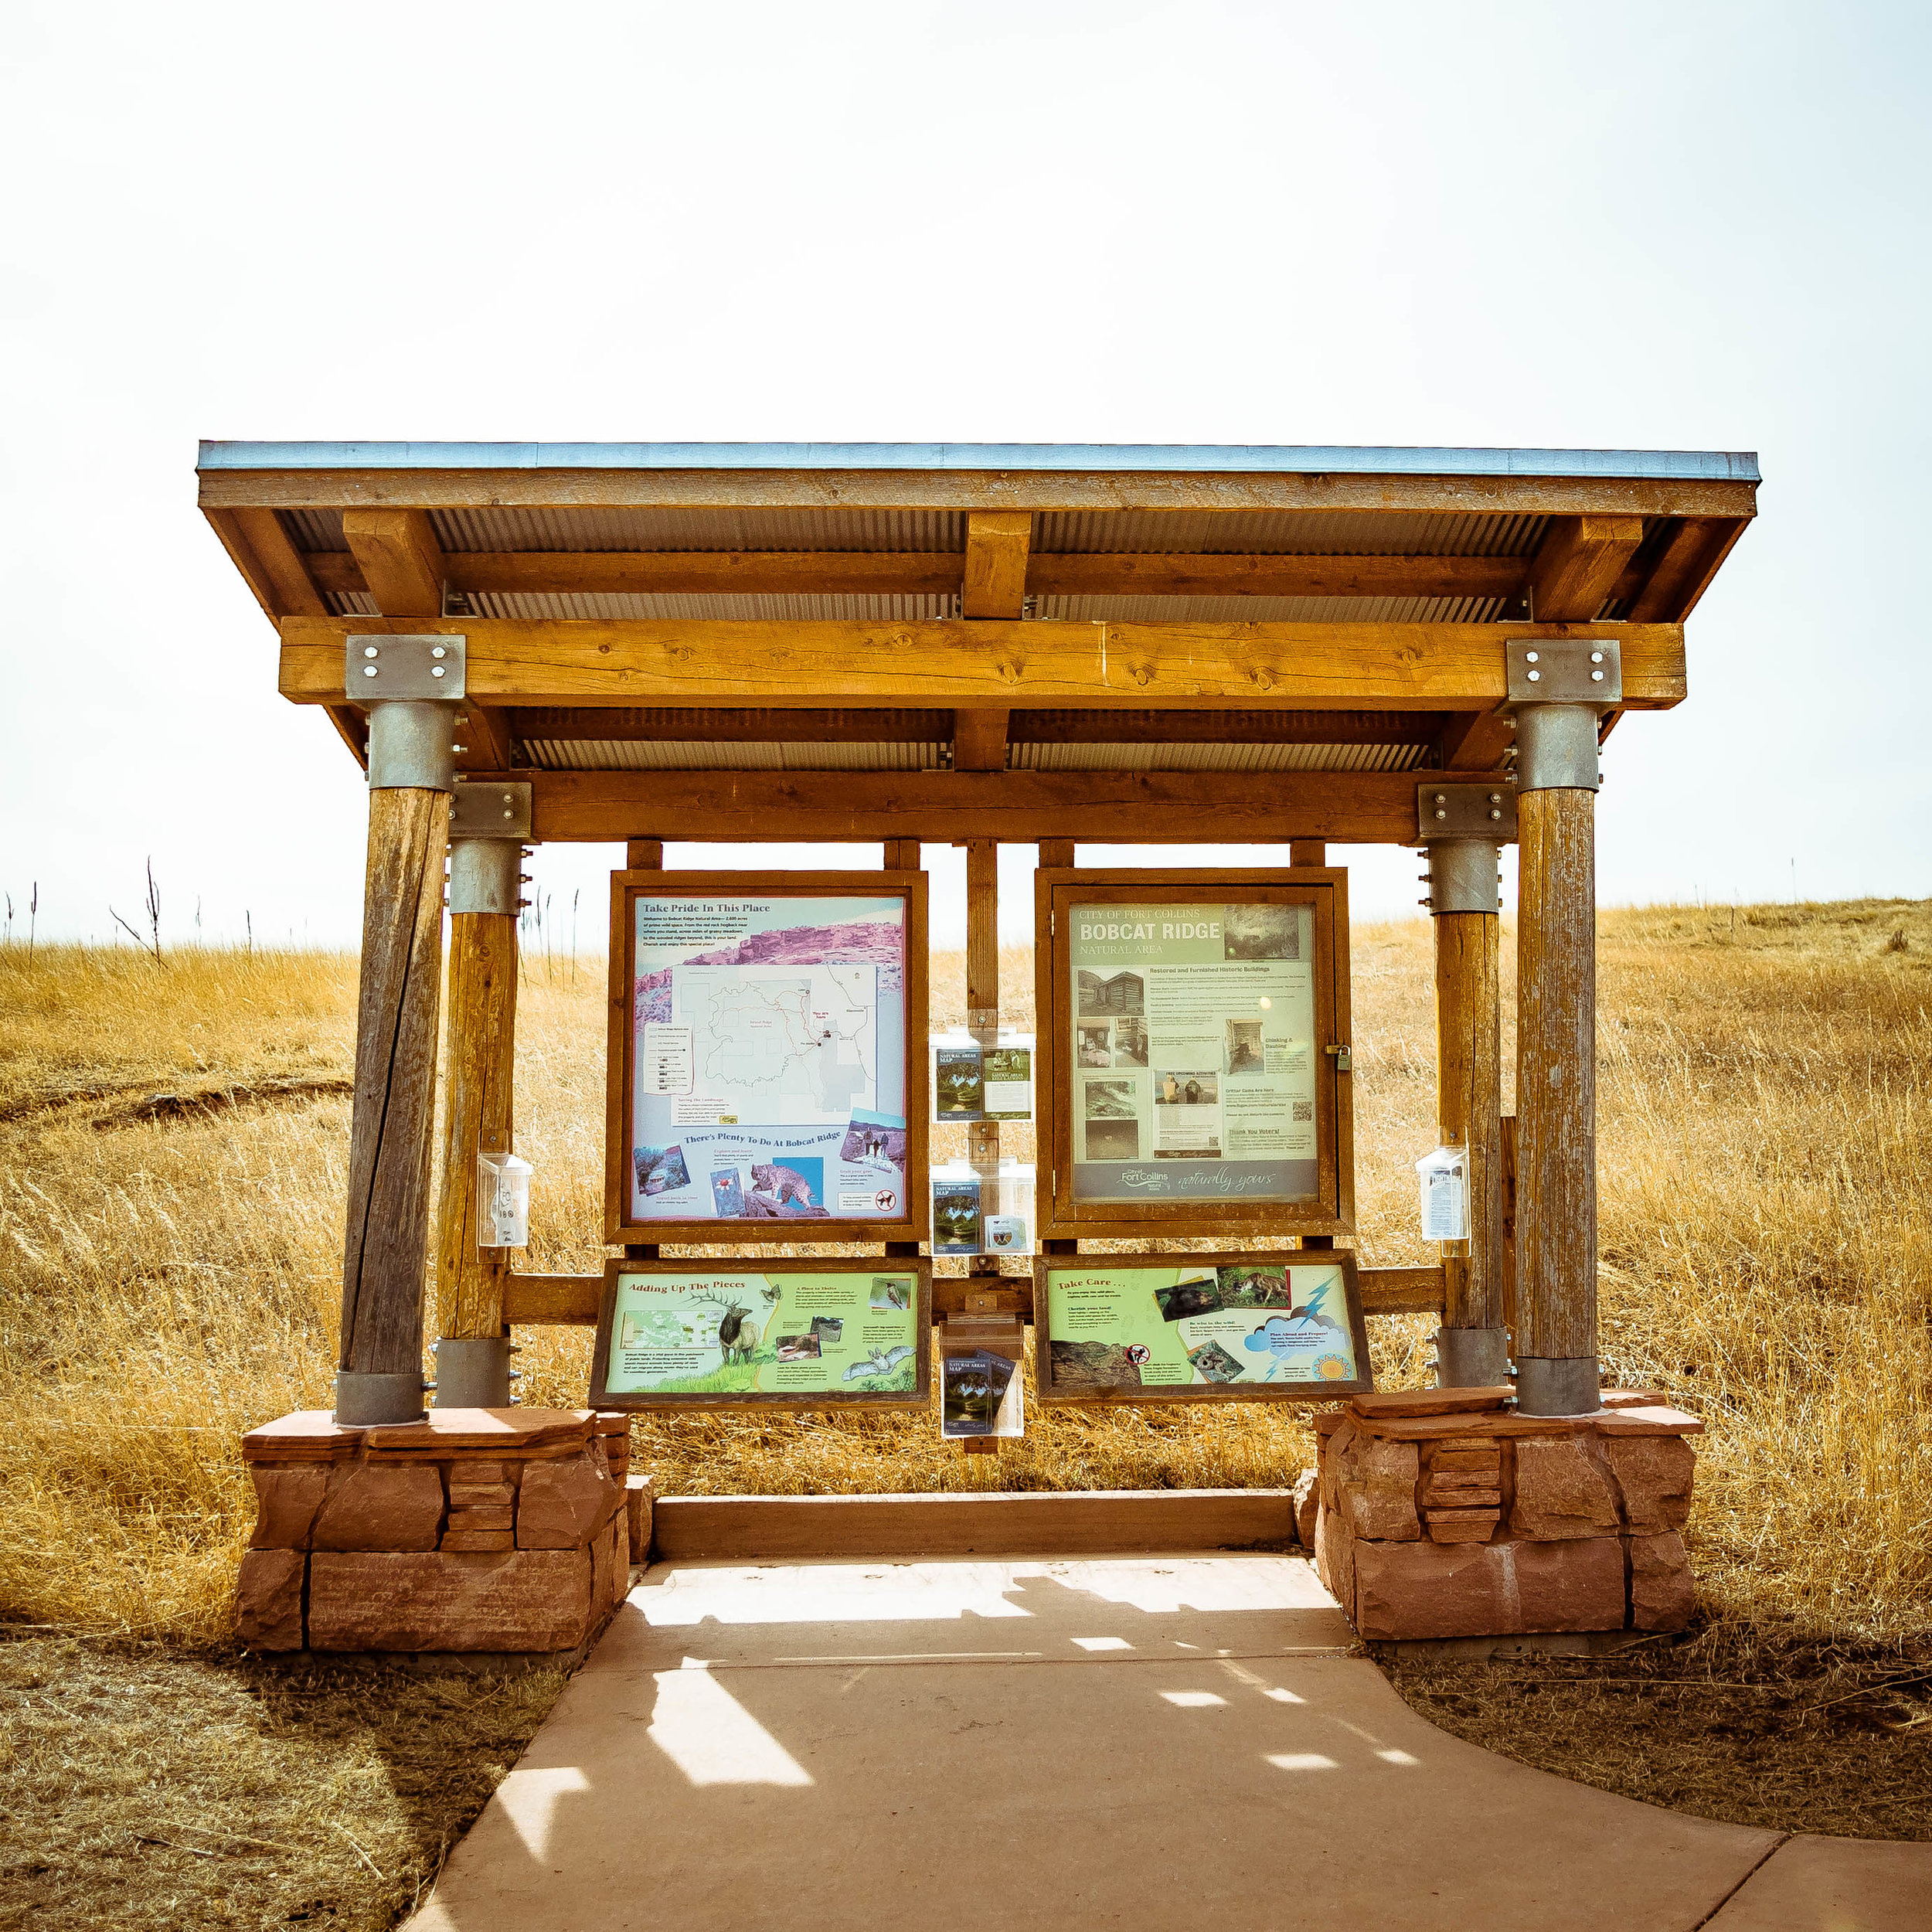 Bobcat Ridge Natural Area Fort Collins, Colorado